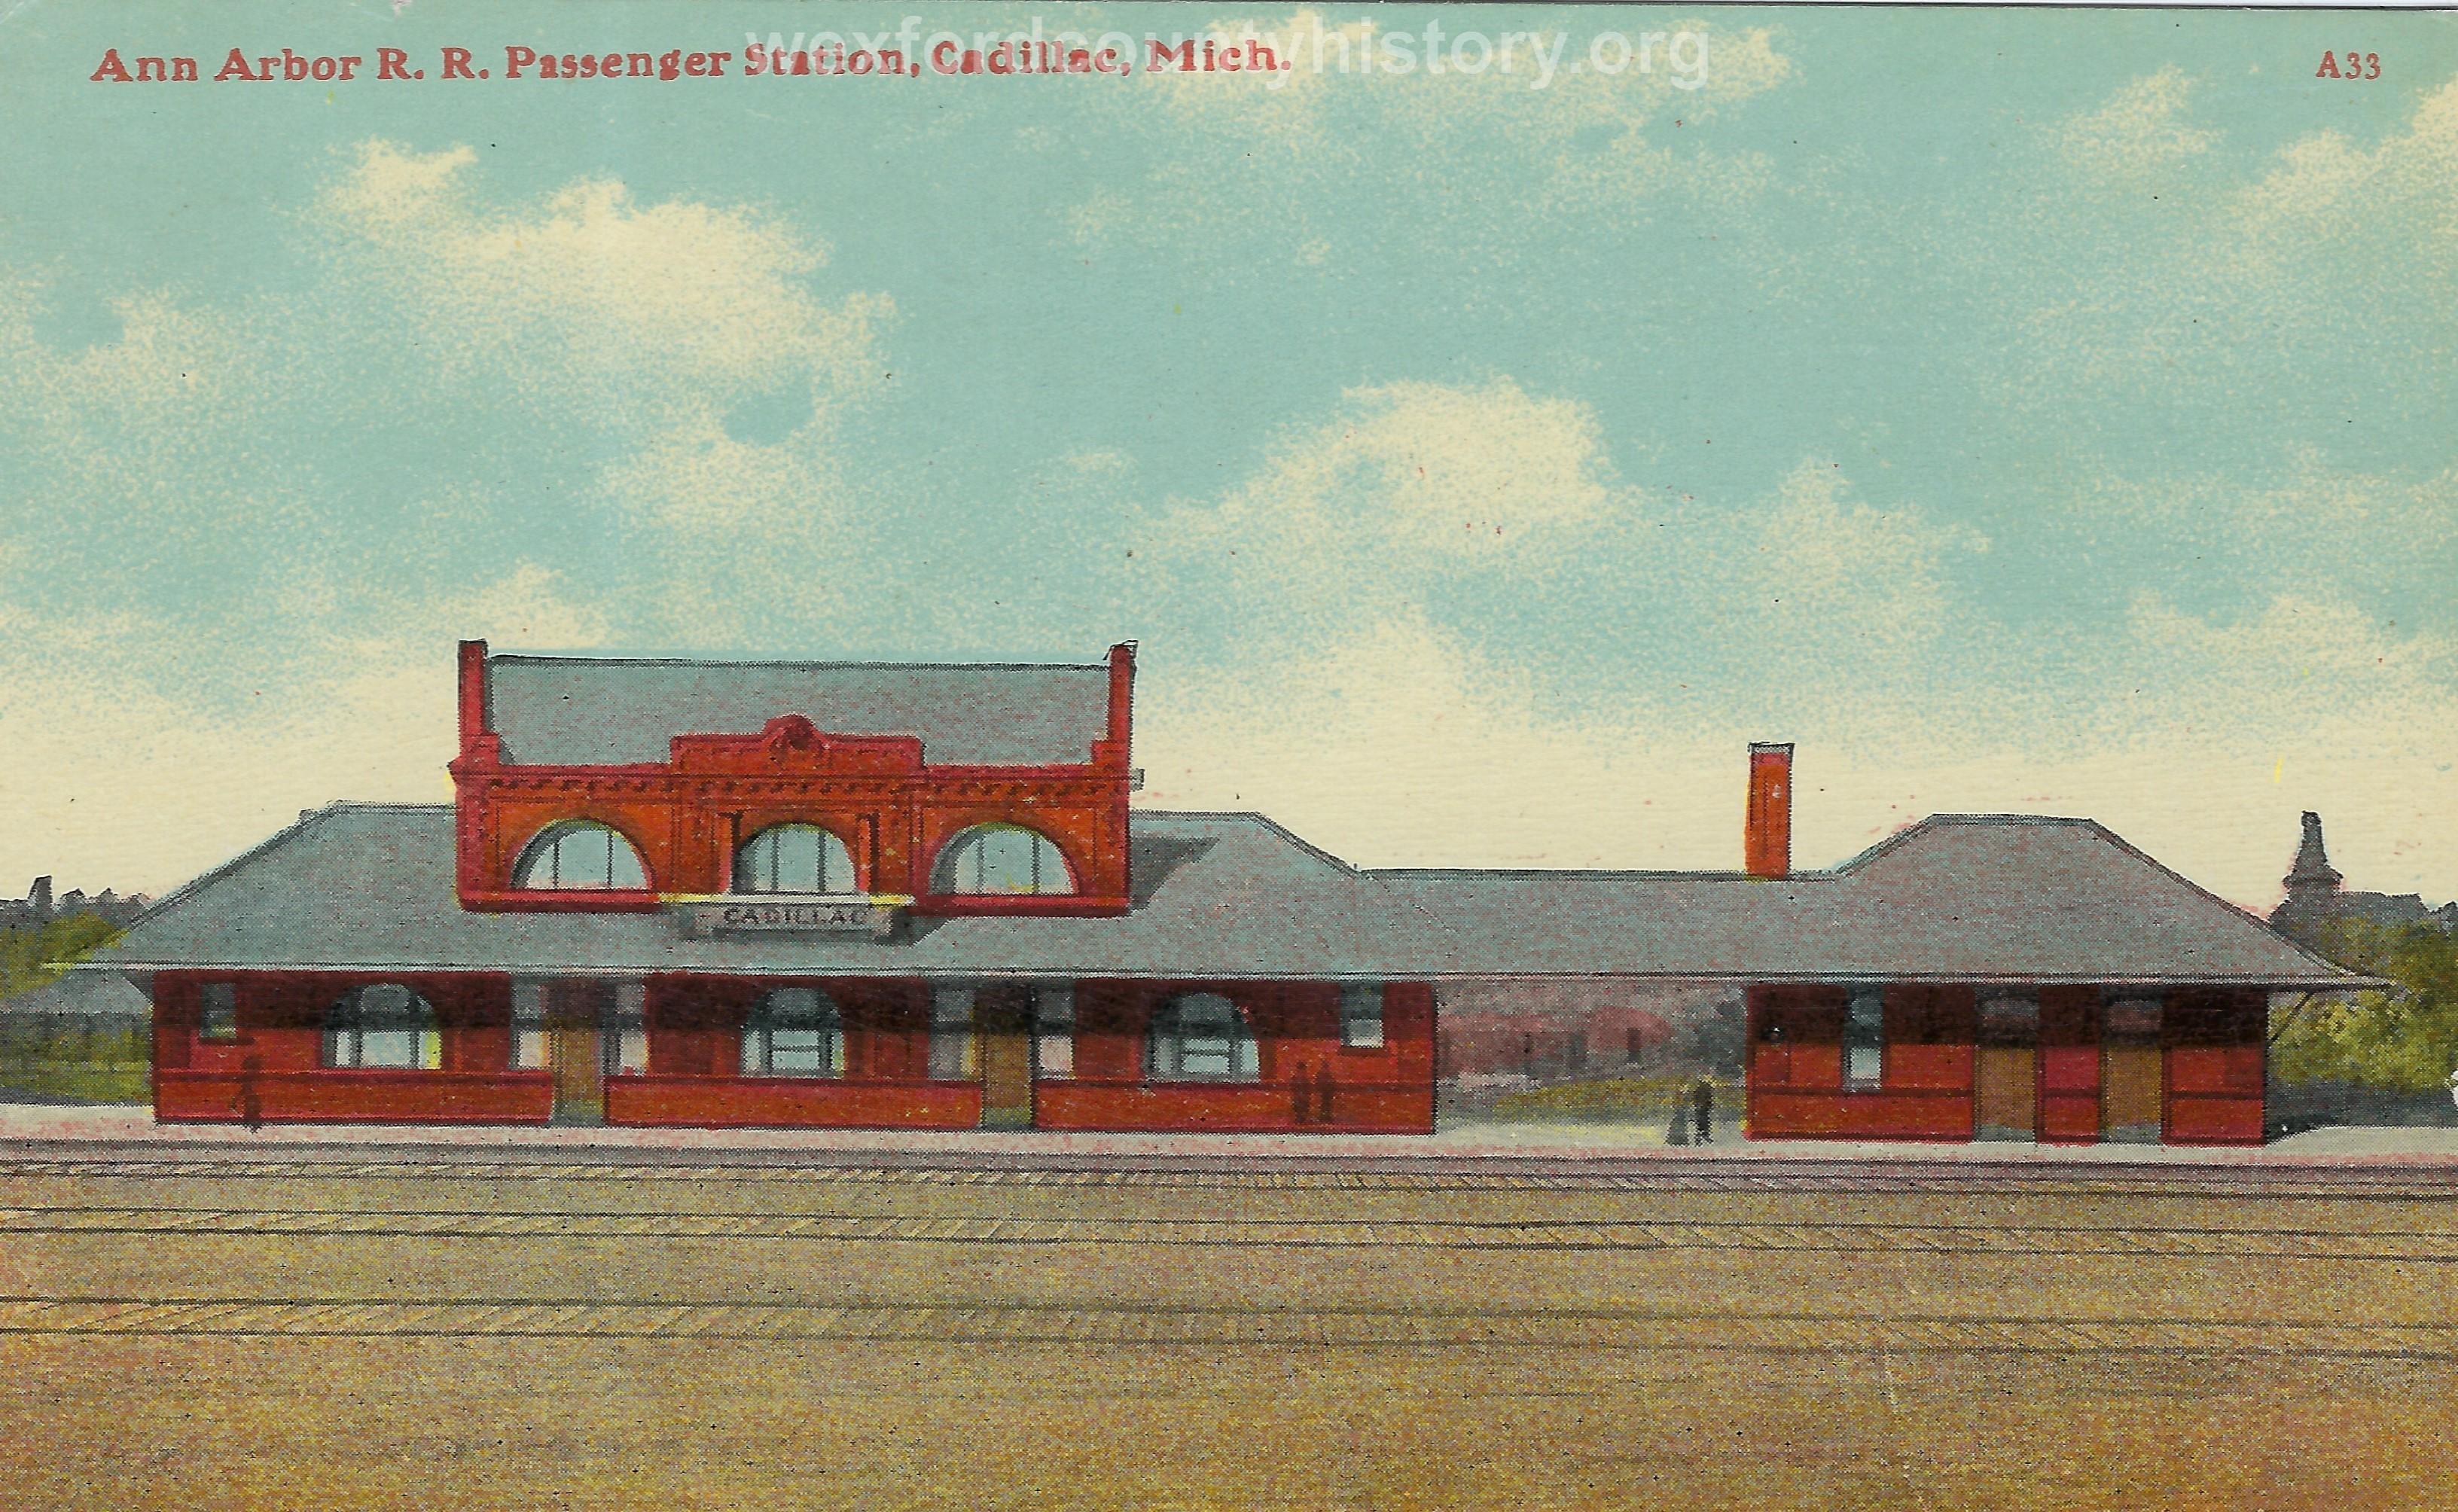 Cadillac-Railroad-Ann-Arbor-Railroad-Depot-3